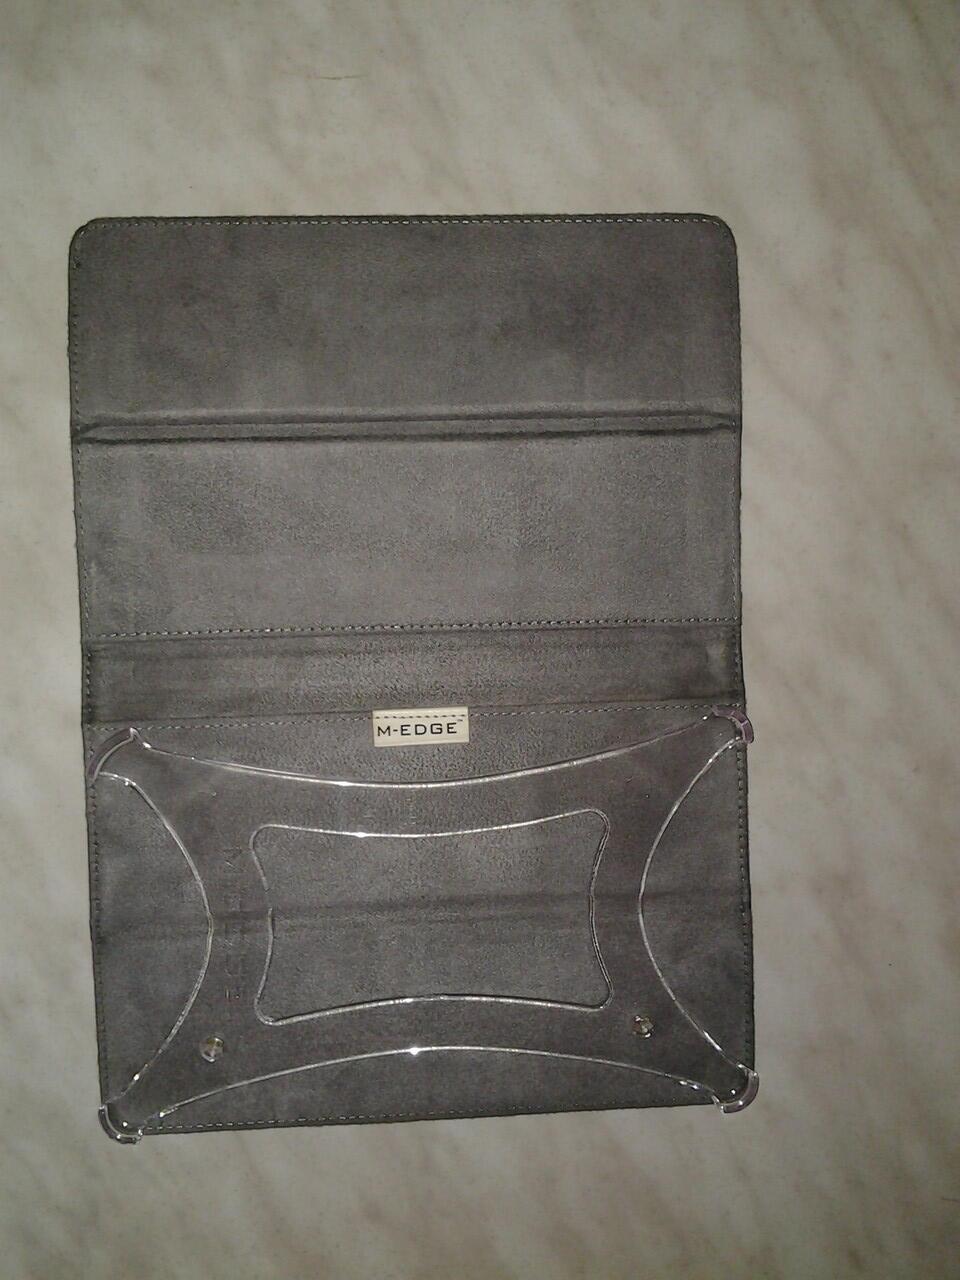 Barnes & Noble NOOK Tablet™ 16GB Full Sets + Case M-Edge